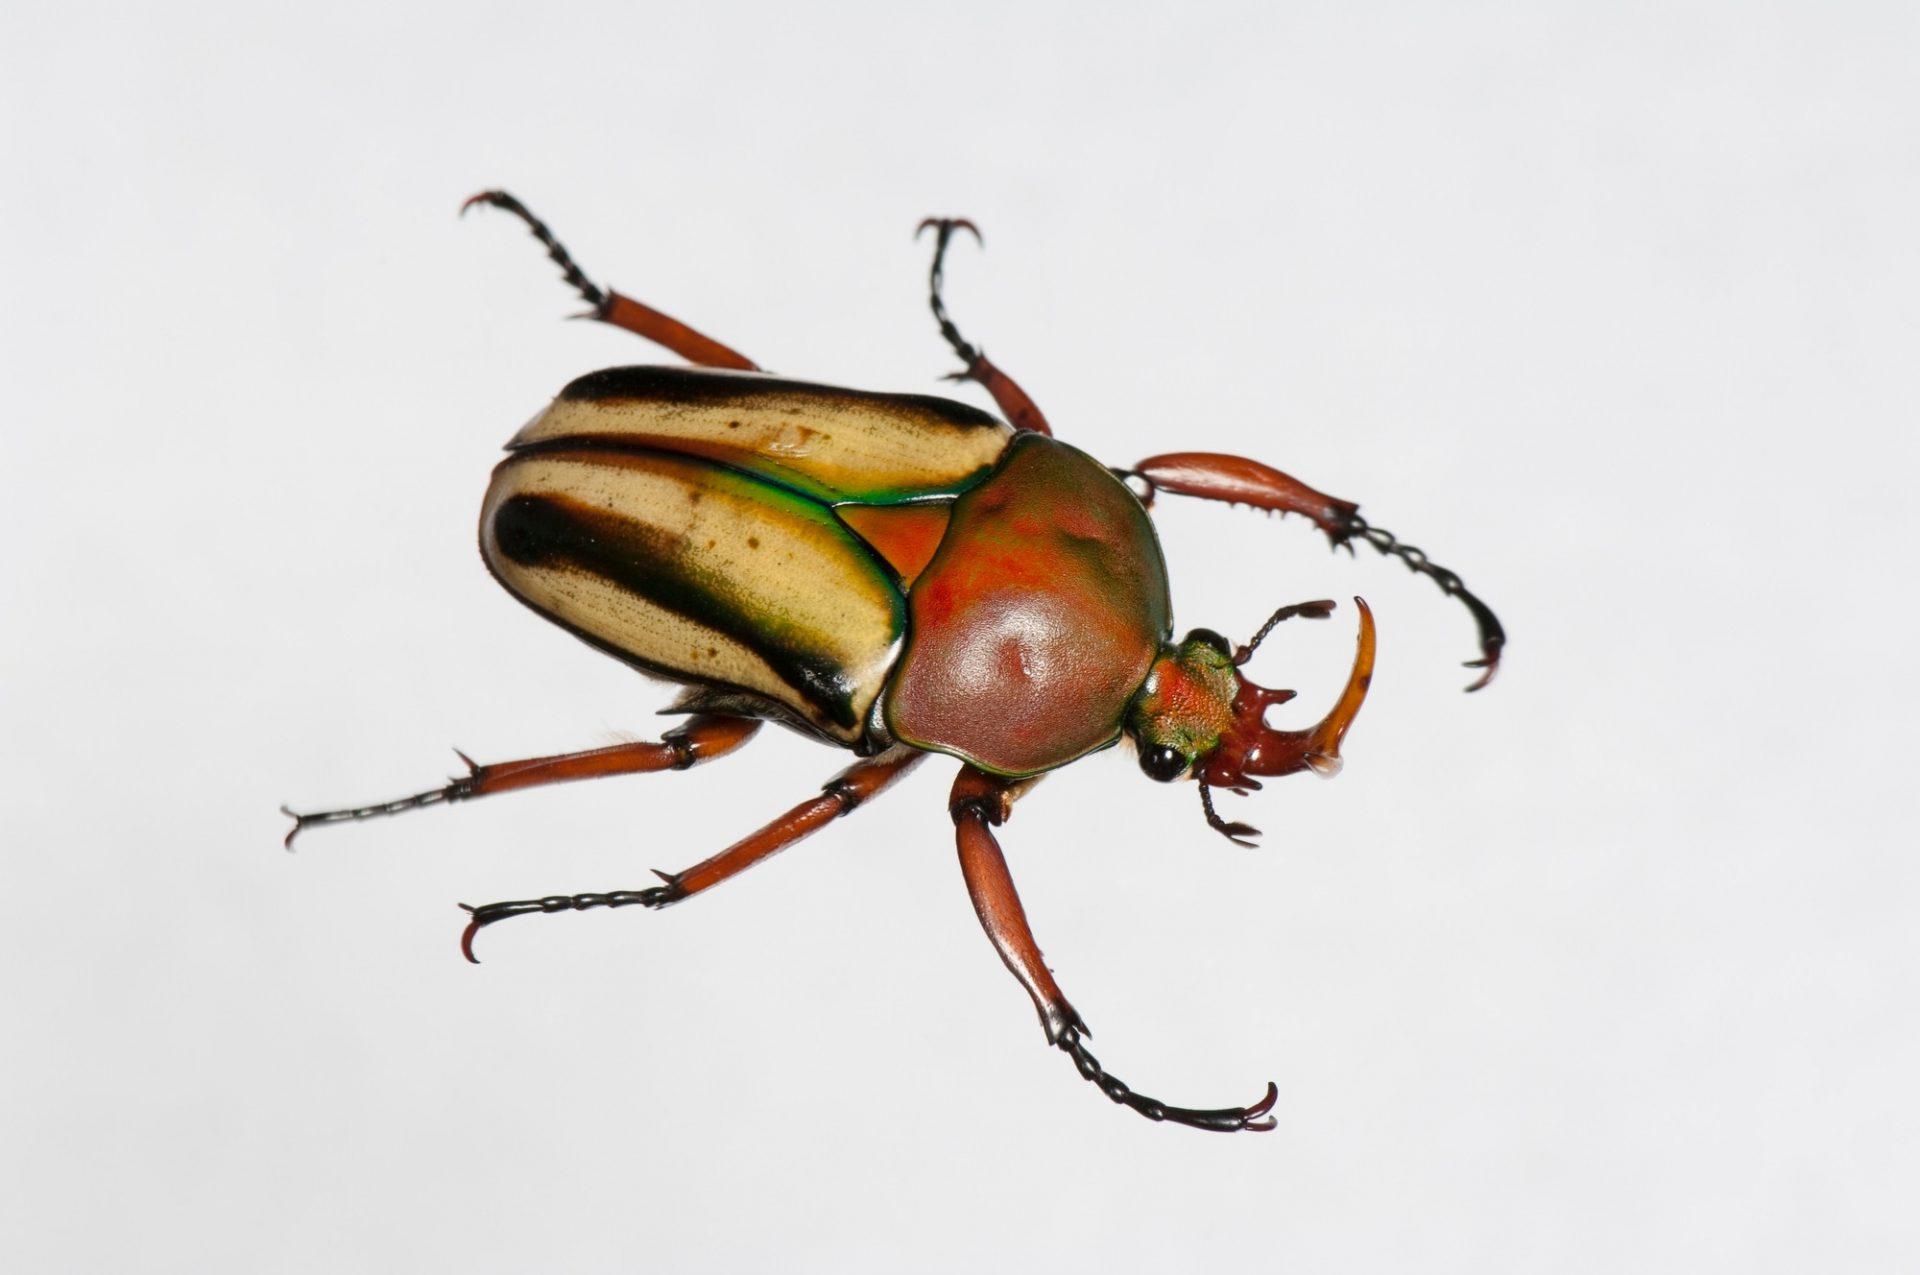 Flamboyant flower beetle (Eudicella gralli) at the St. Louis Zoo.